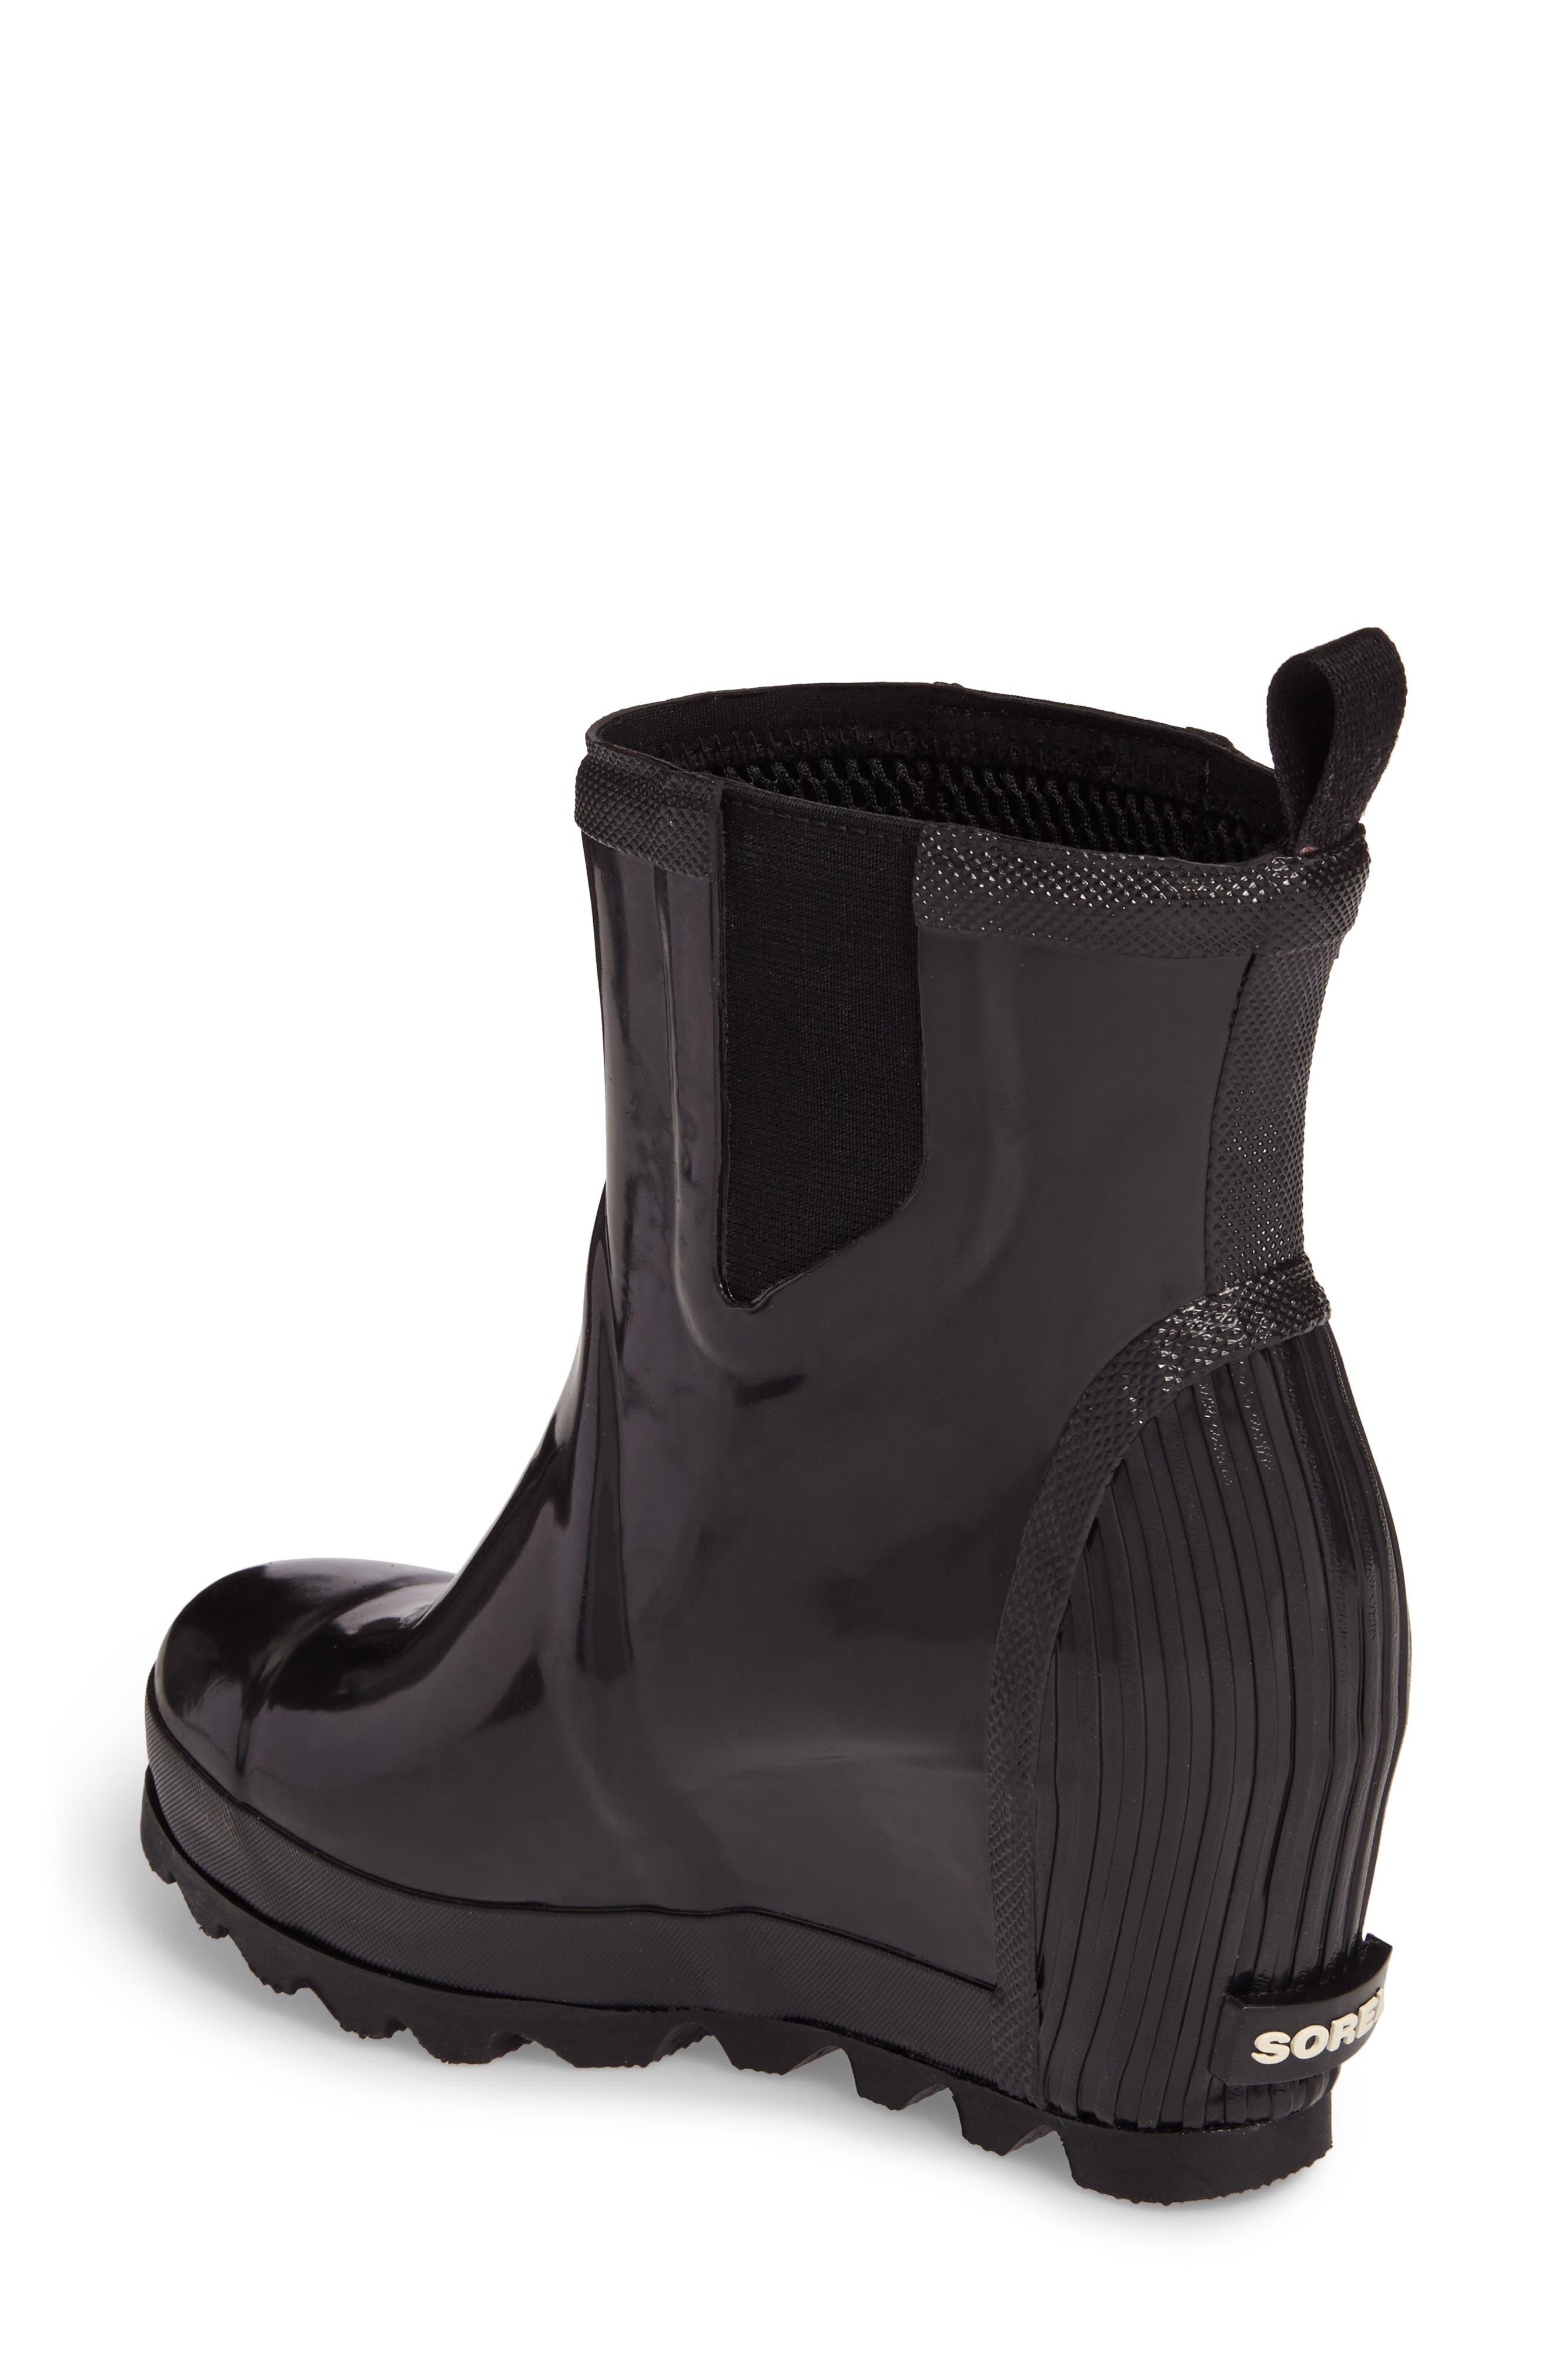 Joan Glossy Wedge Rain Boot,                             Alternate thumbnail 2, color,                             Black/ Sea Salt